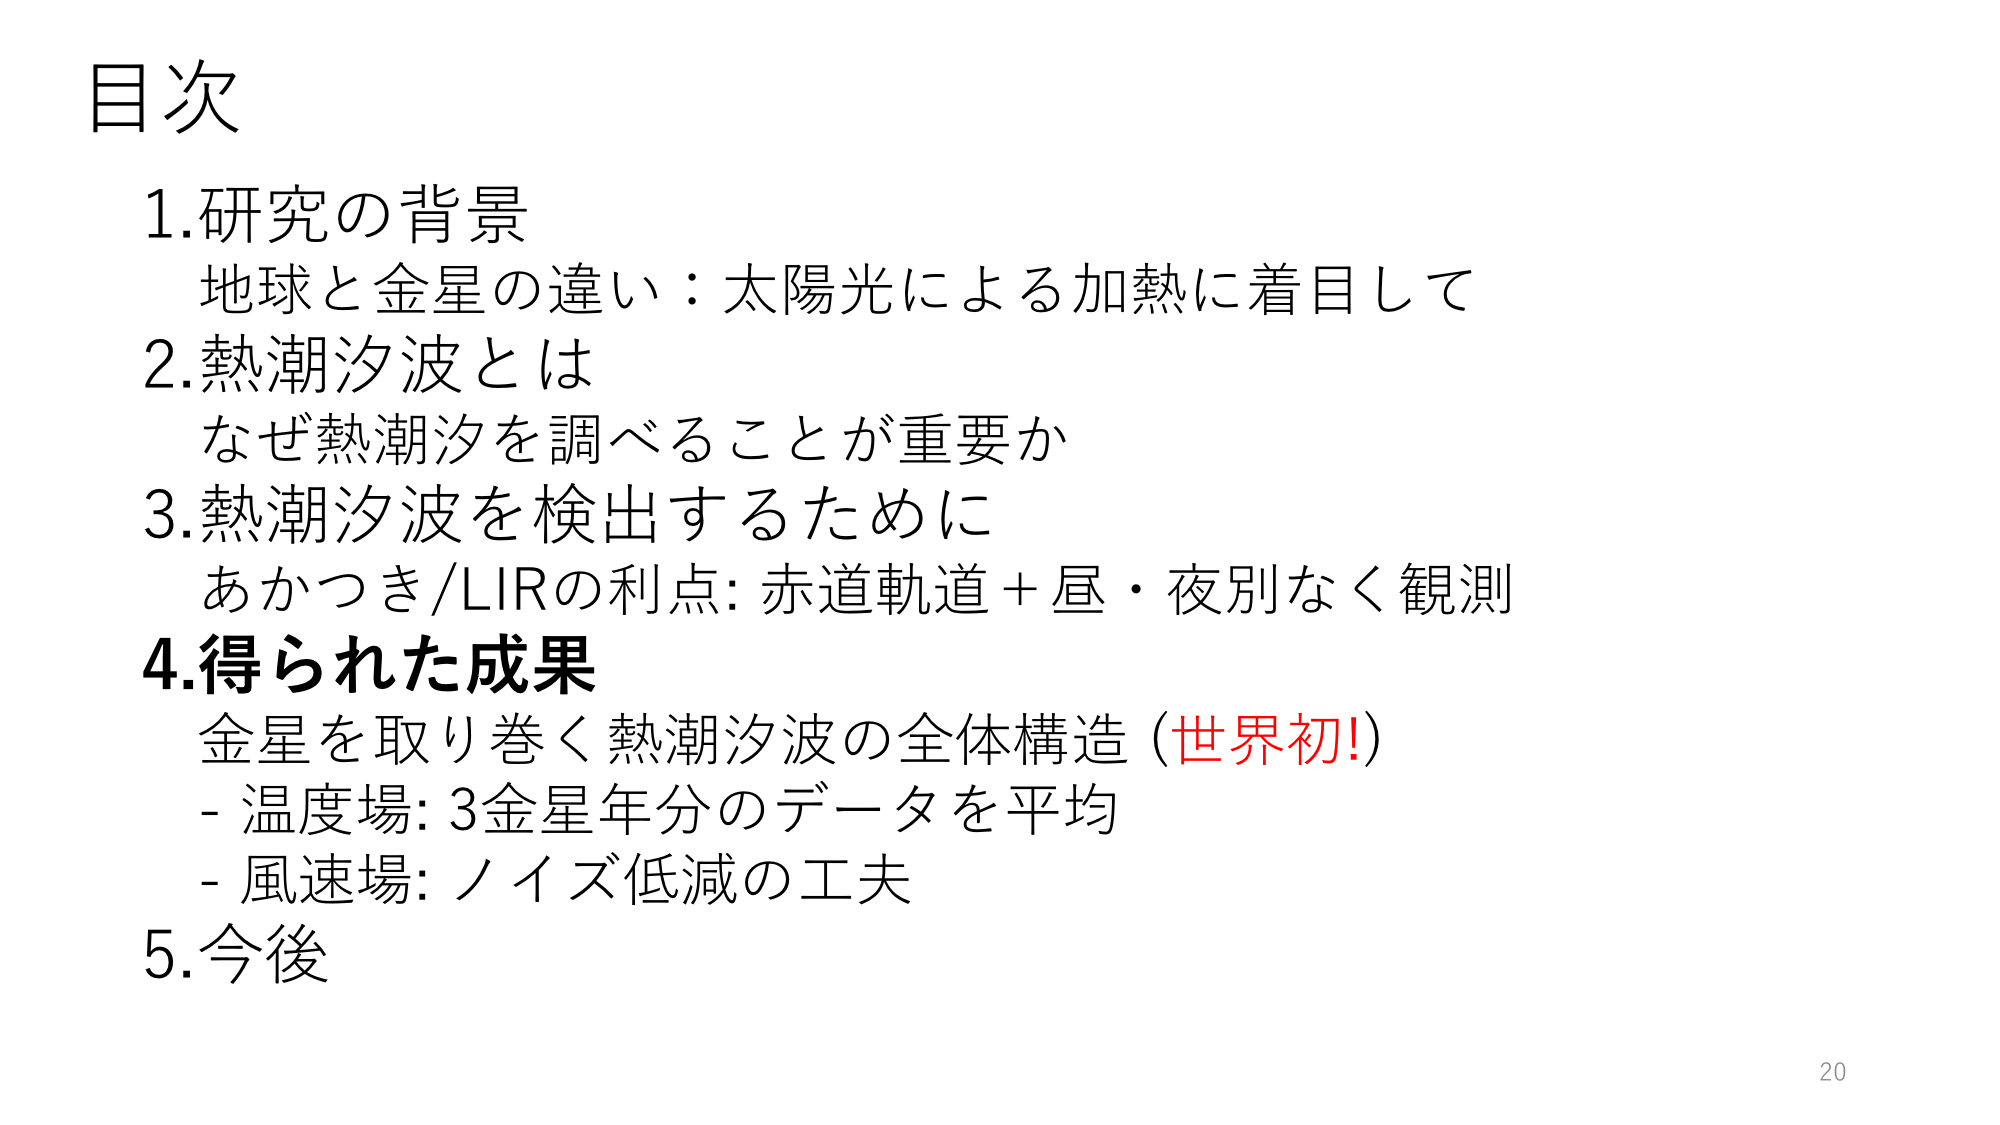 f:id:Imamura:20191119205538p:plain